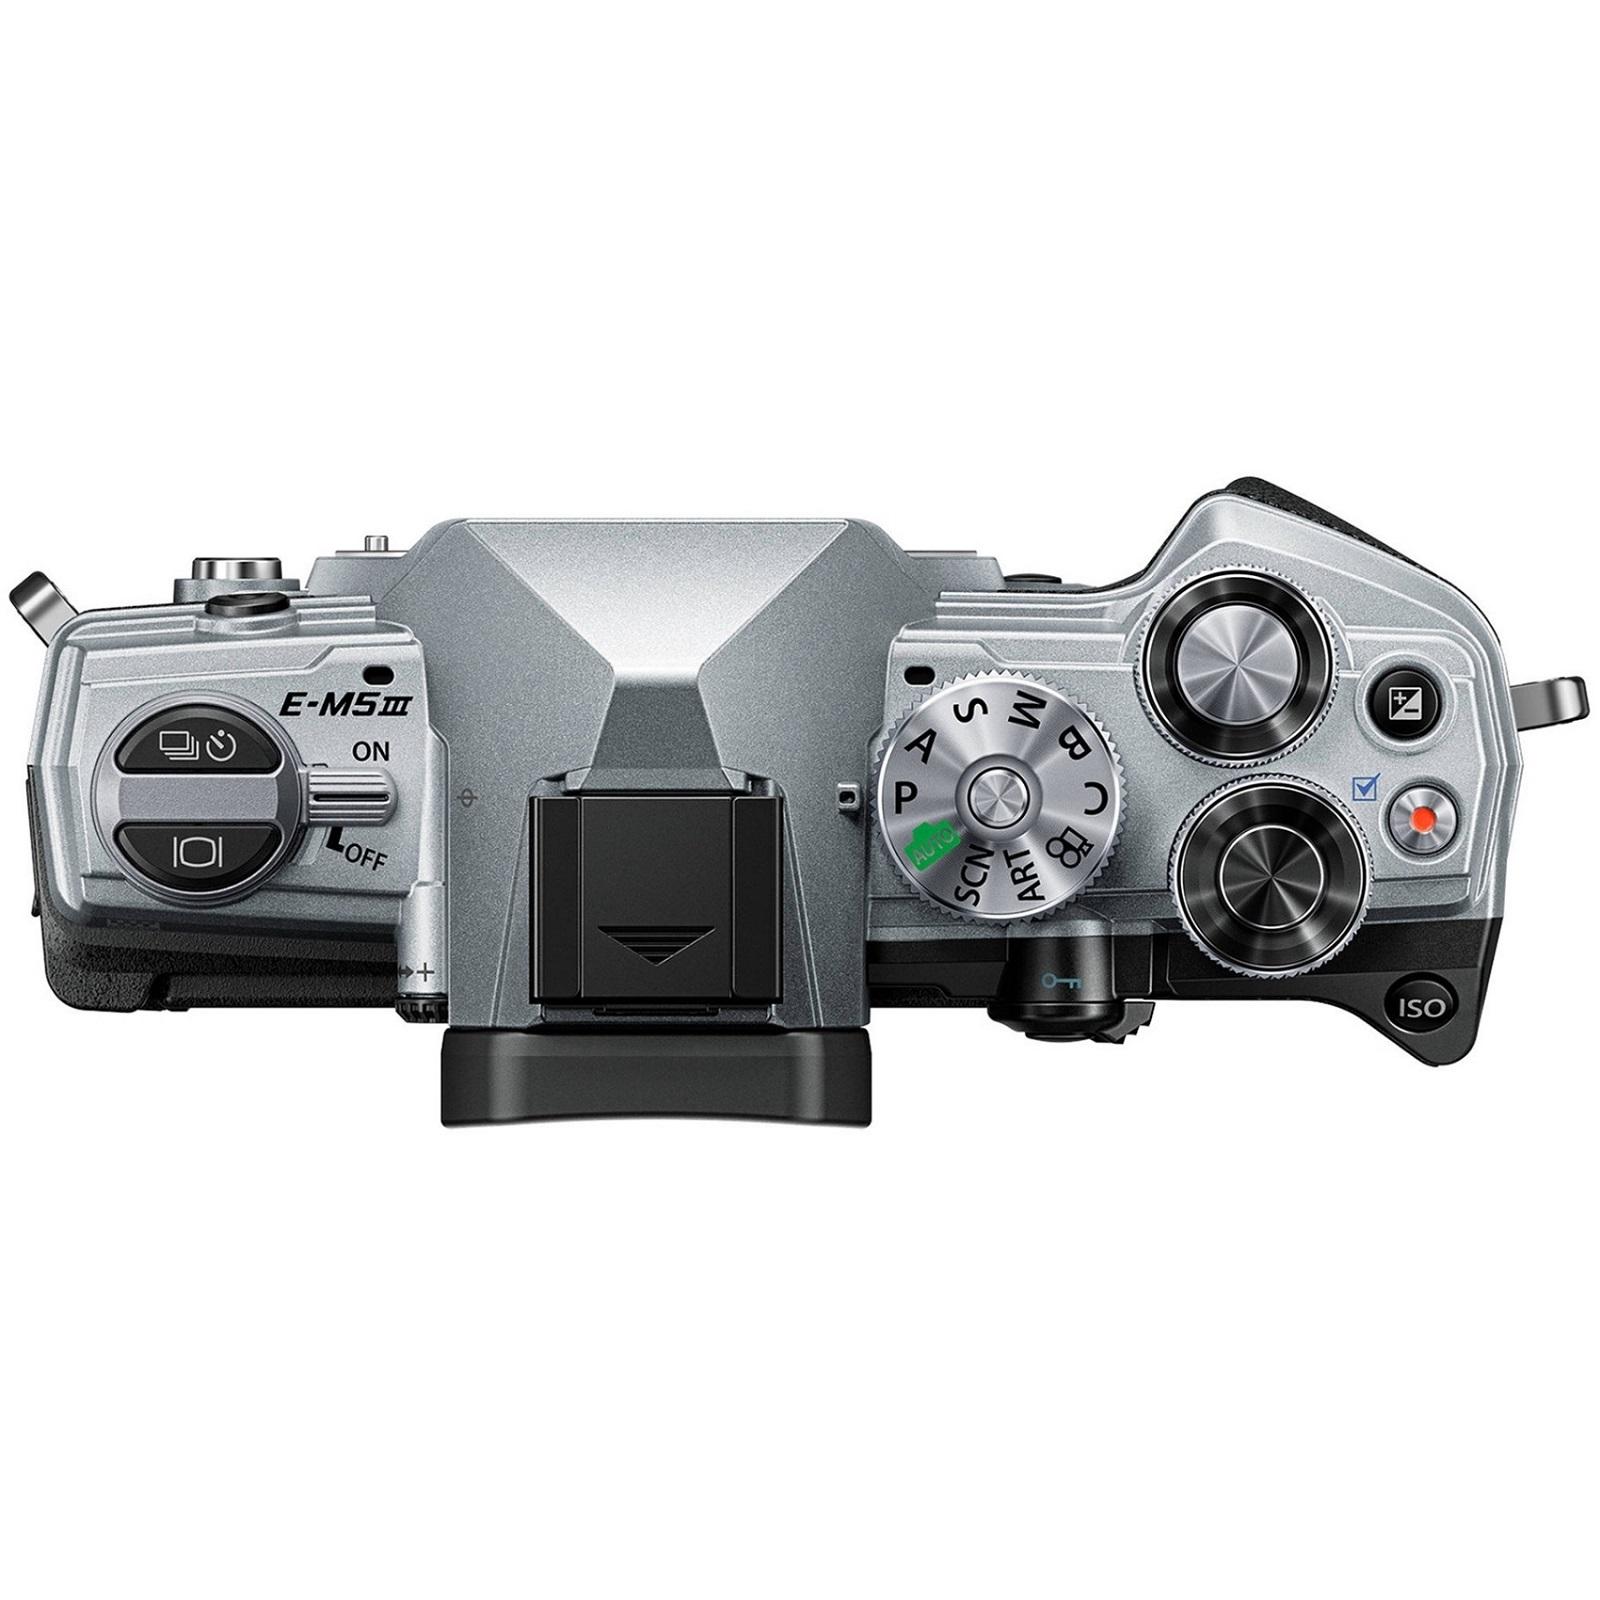 OLYMPUS オリンパス ミラーレス一眼カメラ OM-D E-M5 MarkIII ボディー シルバー 新品